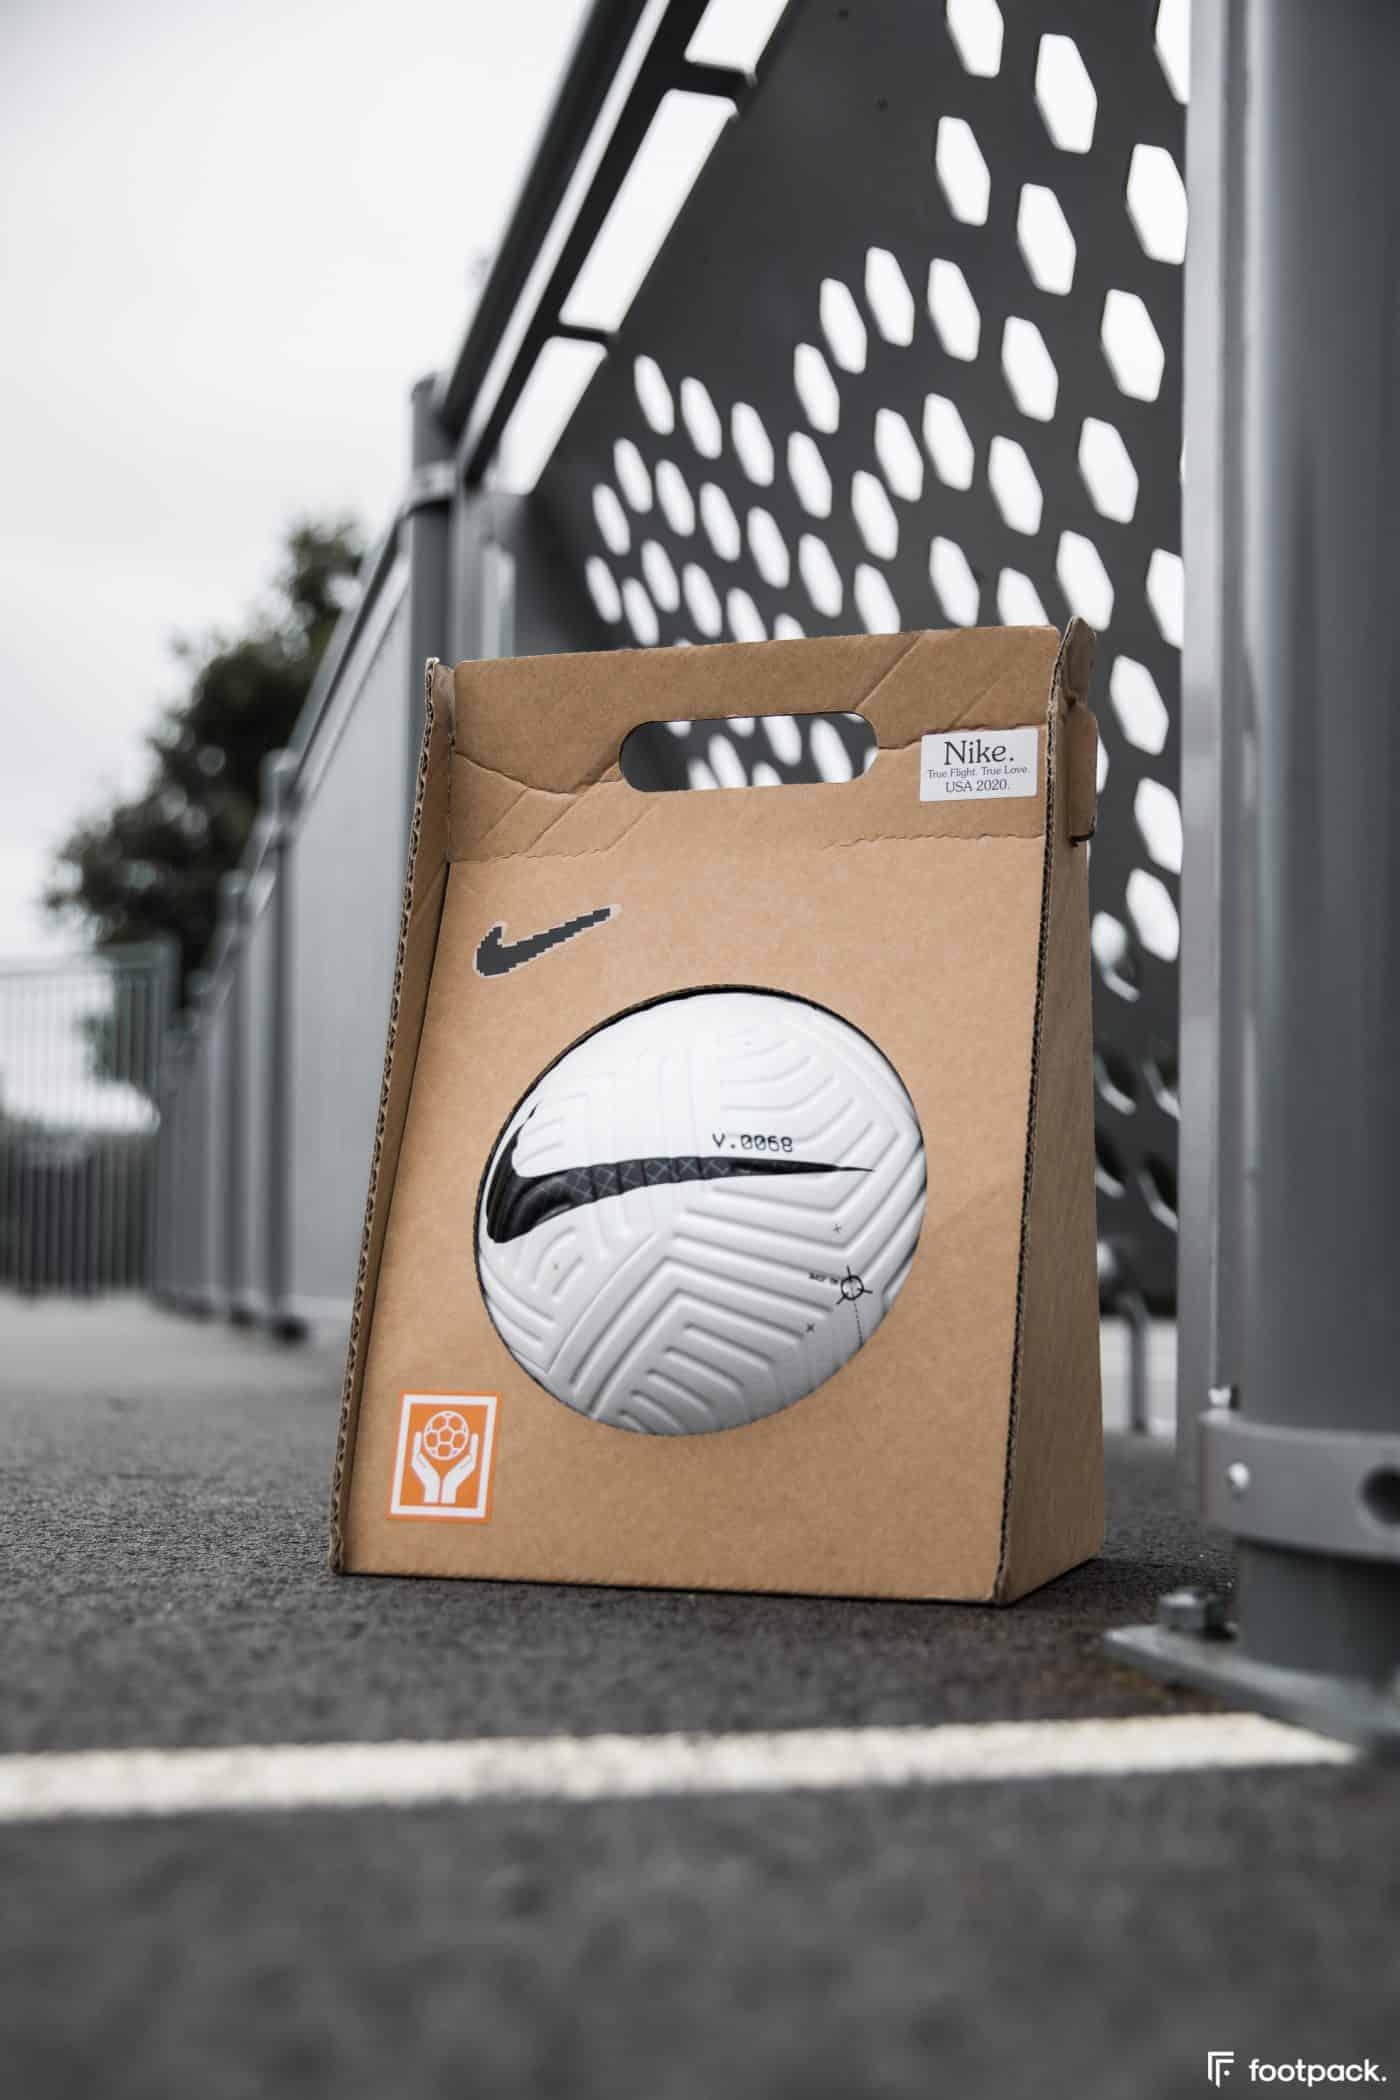 ballon-nike-flight-premier-league-serie-a-footpack-1